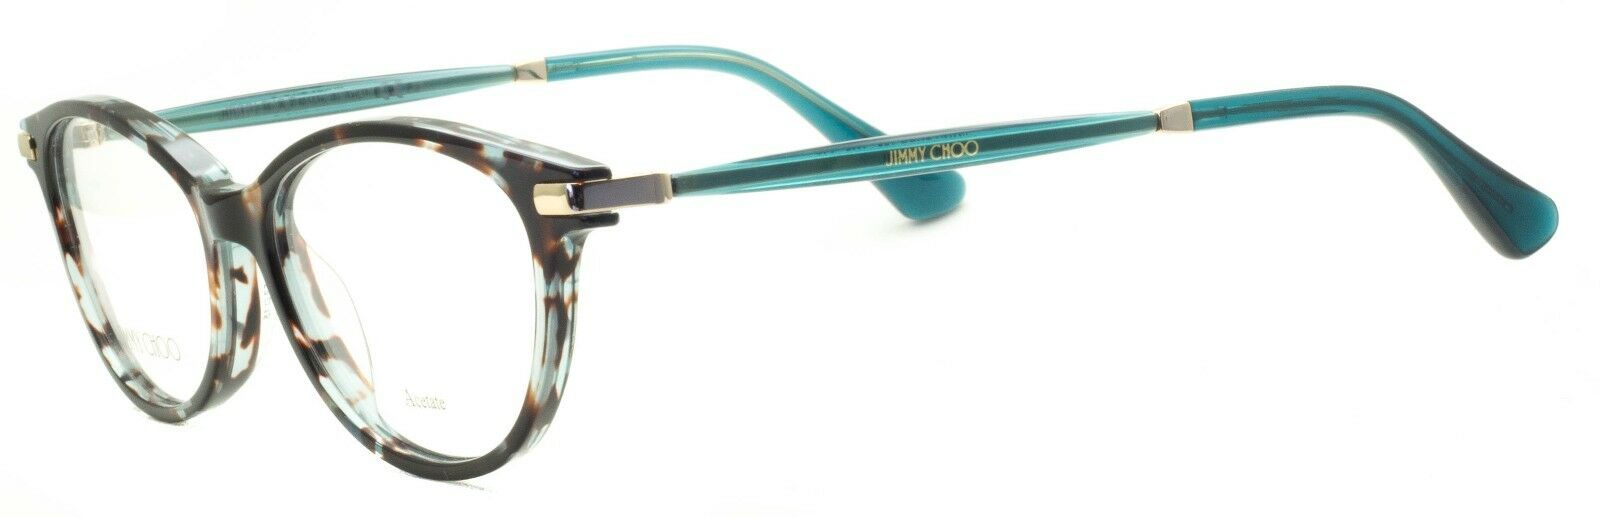 3eb87c714ed4 Jimmy Choo 153 1m5 Eyewear Glasses RX Optical Glasses Frames Italy ...